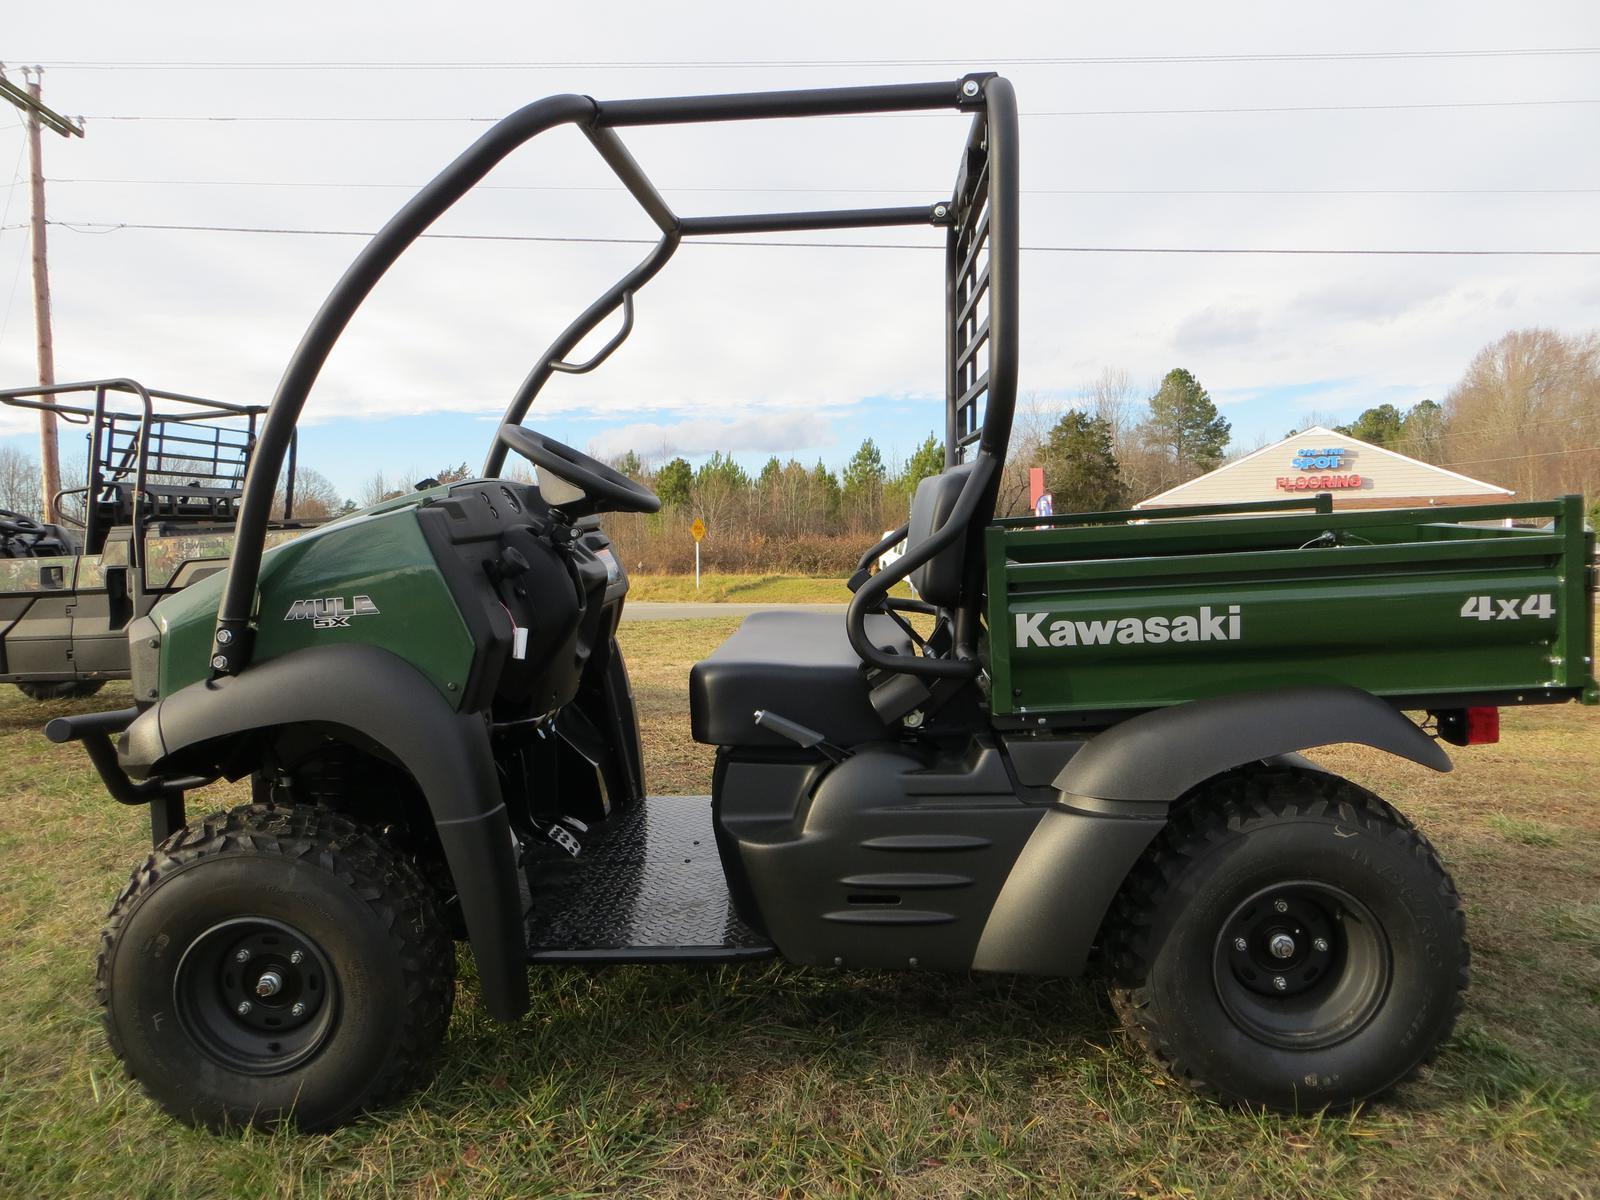 2018 Kawasaki MULE SX™ 4x4 for sale in Powhatan, VA. Ultimate Cycle